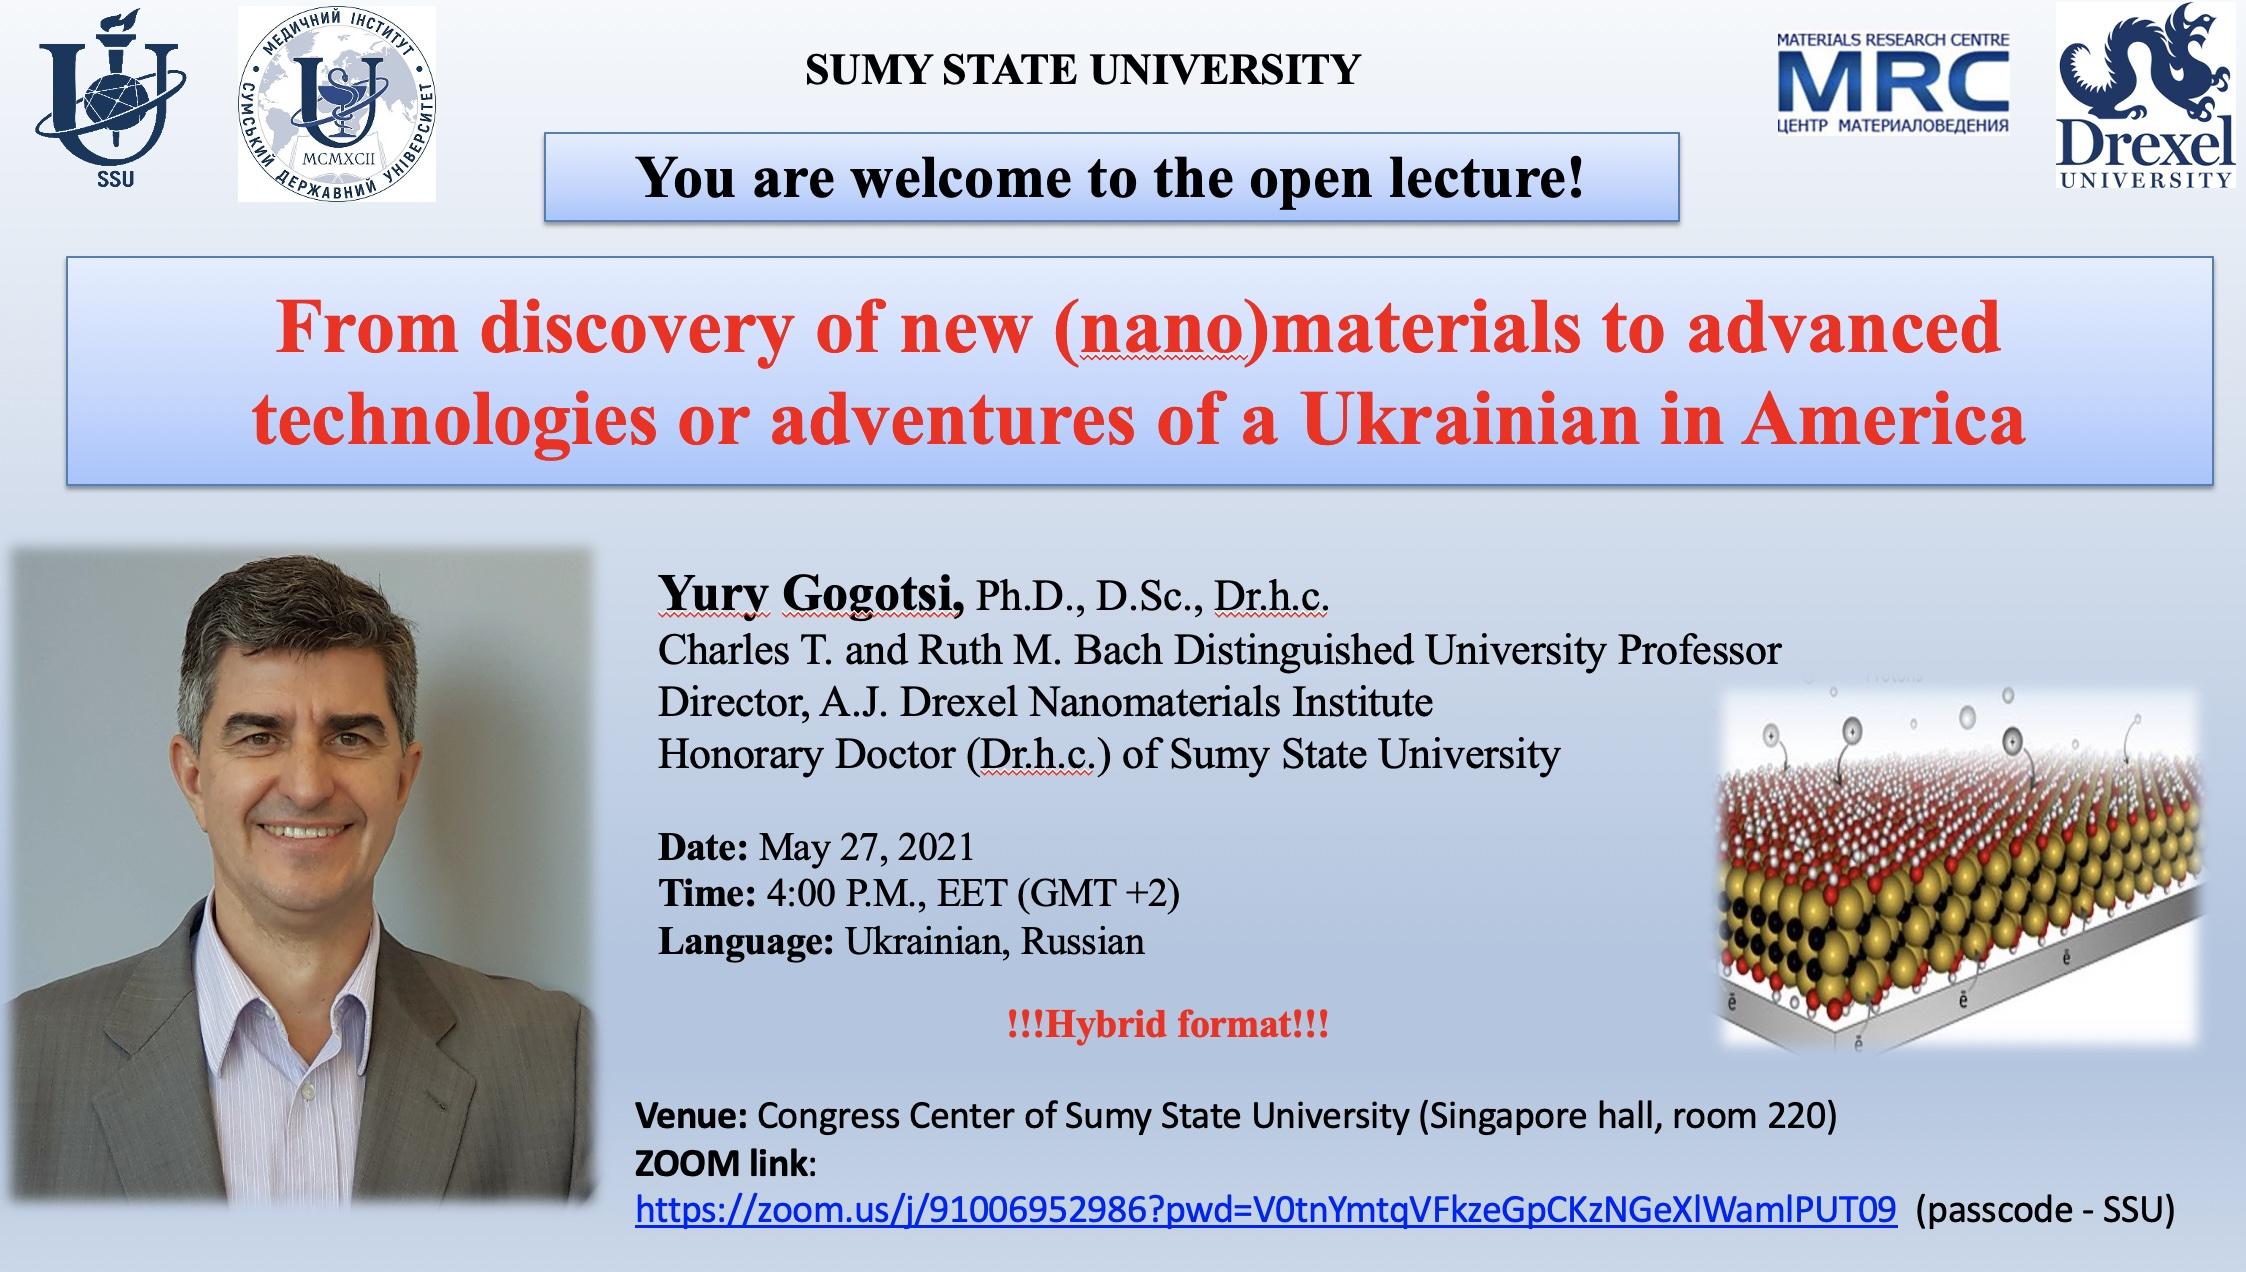 Professor Yury Gogotsi Will Give a Talk at the Sumy State University